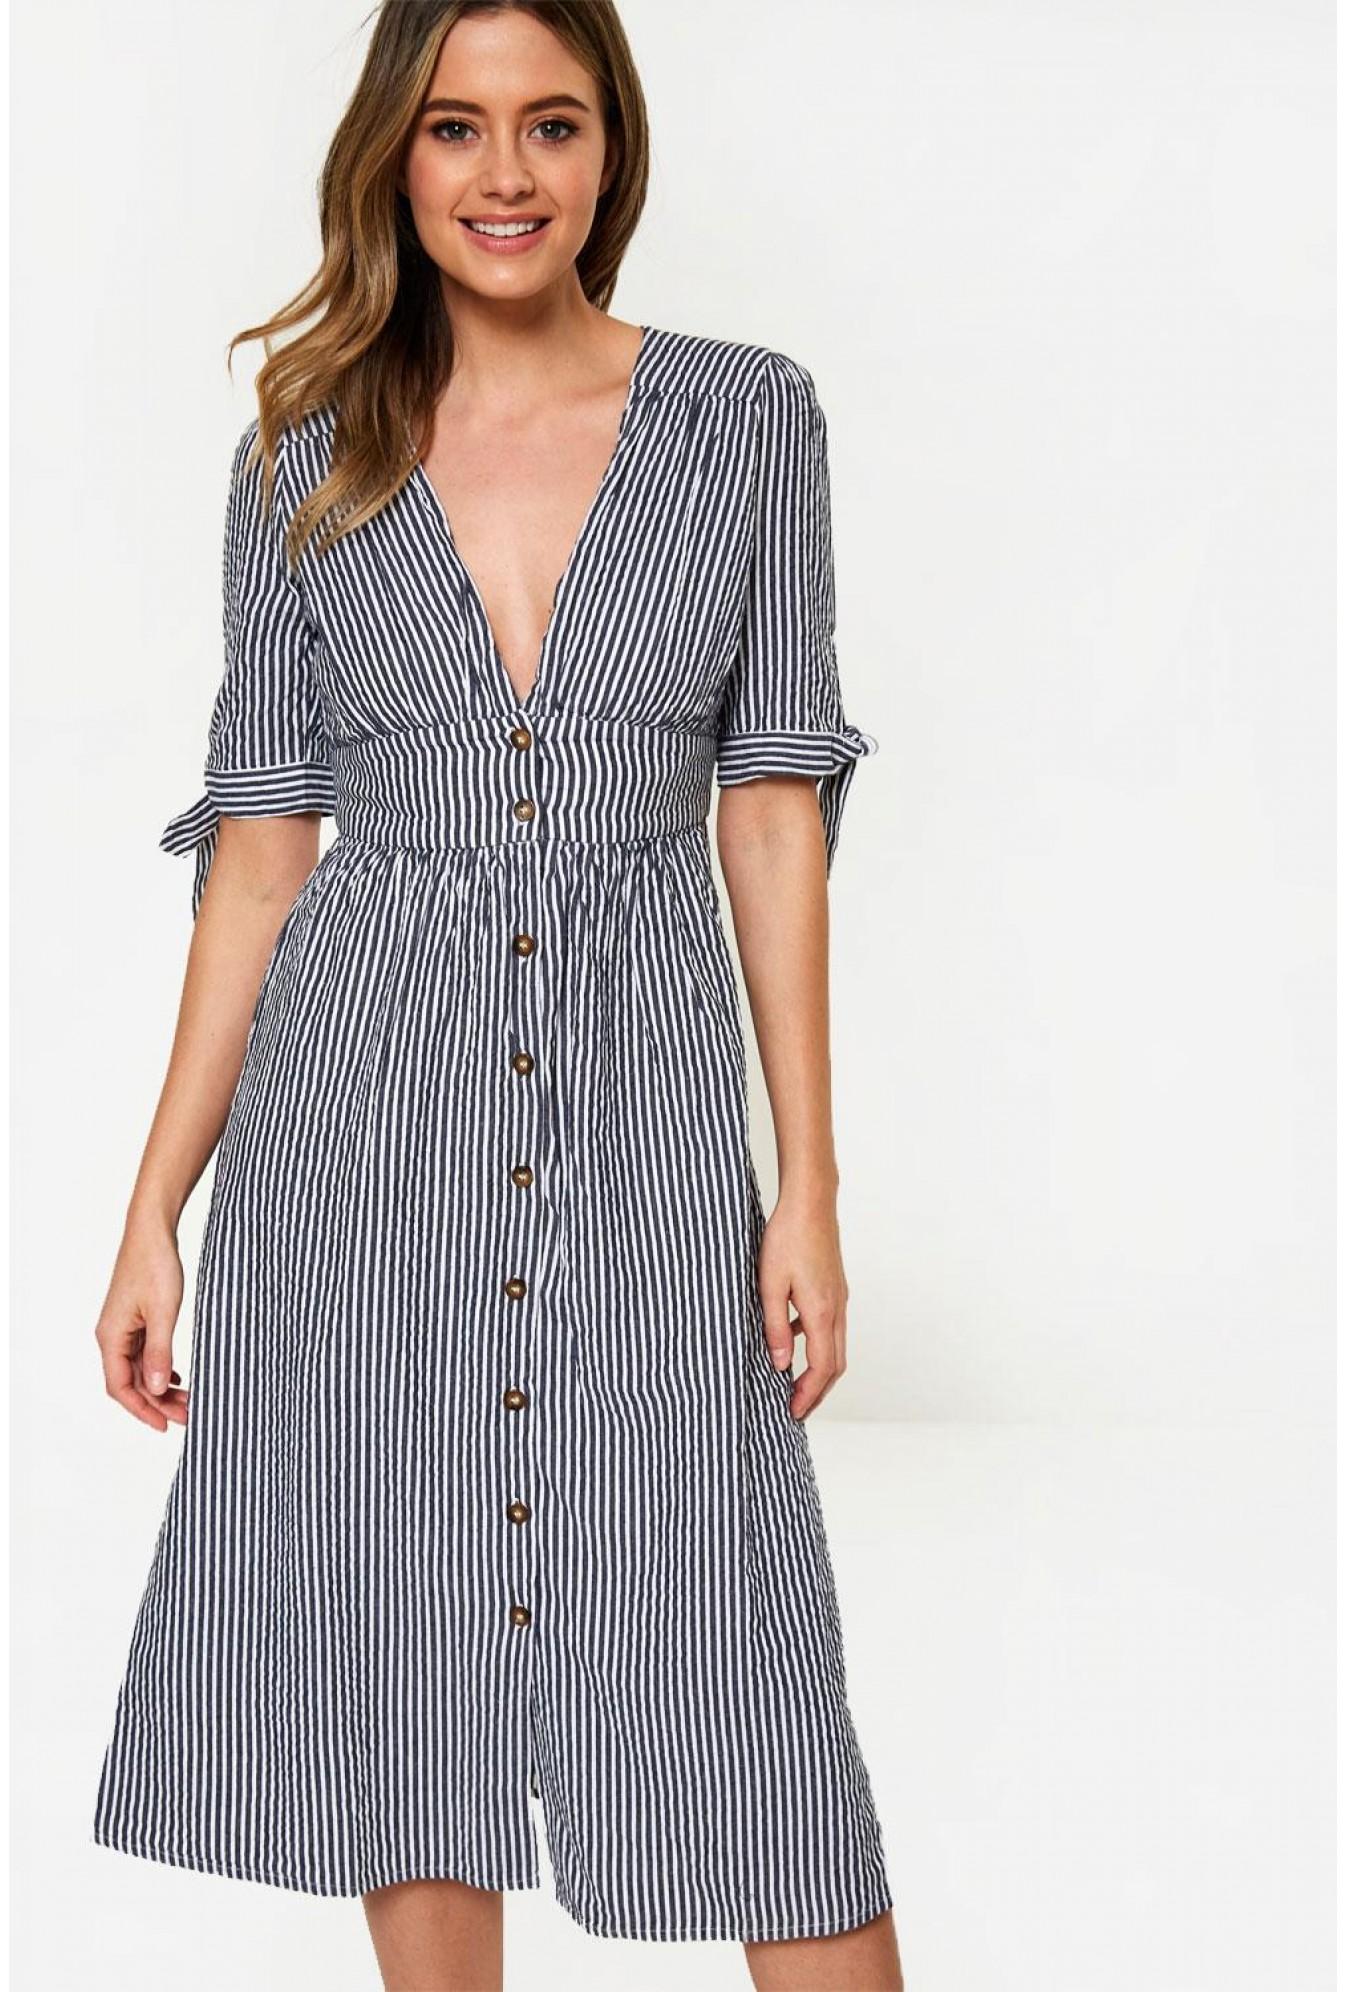 98a1cfa312e Vero Moda Button Up Stripe Midi Dress in Navy | iCLOTHING